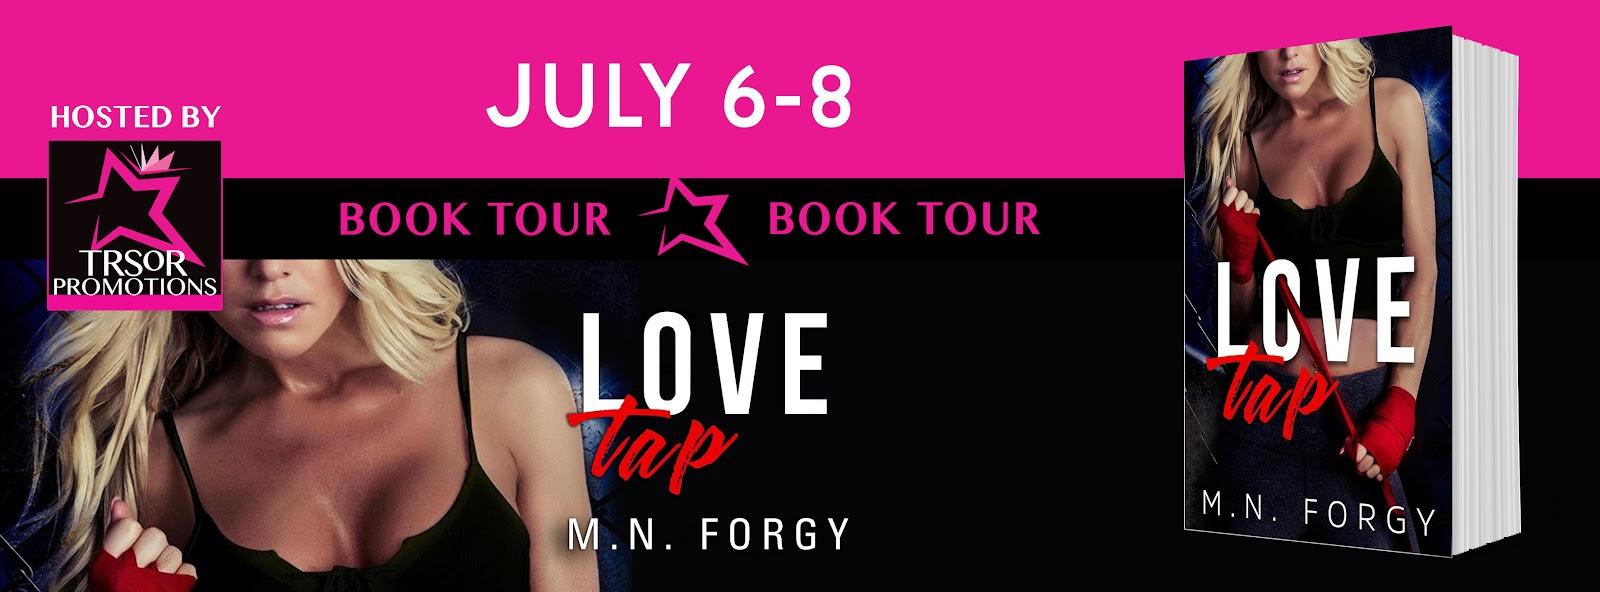 LOVETAP_BOOK_TOUR.jpg